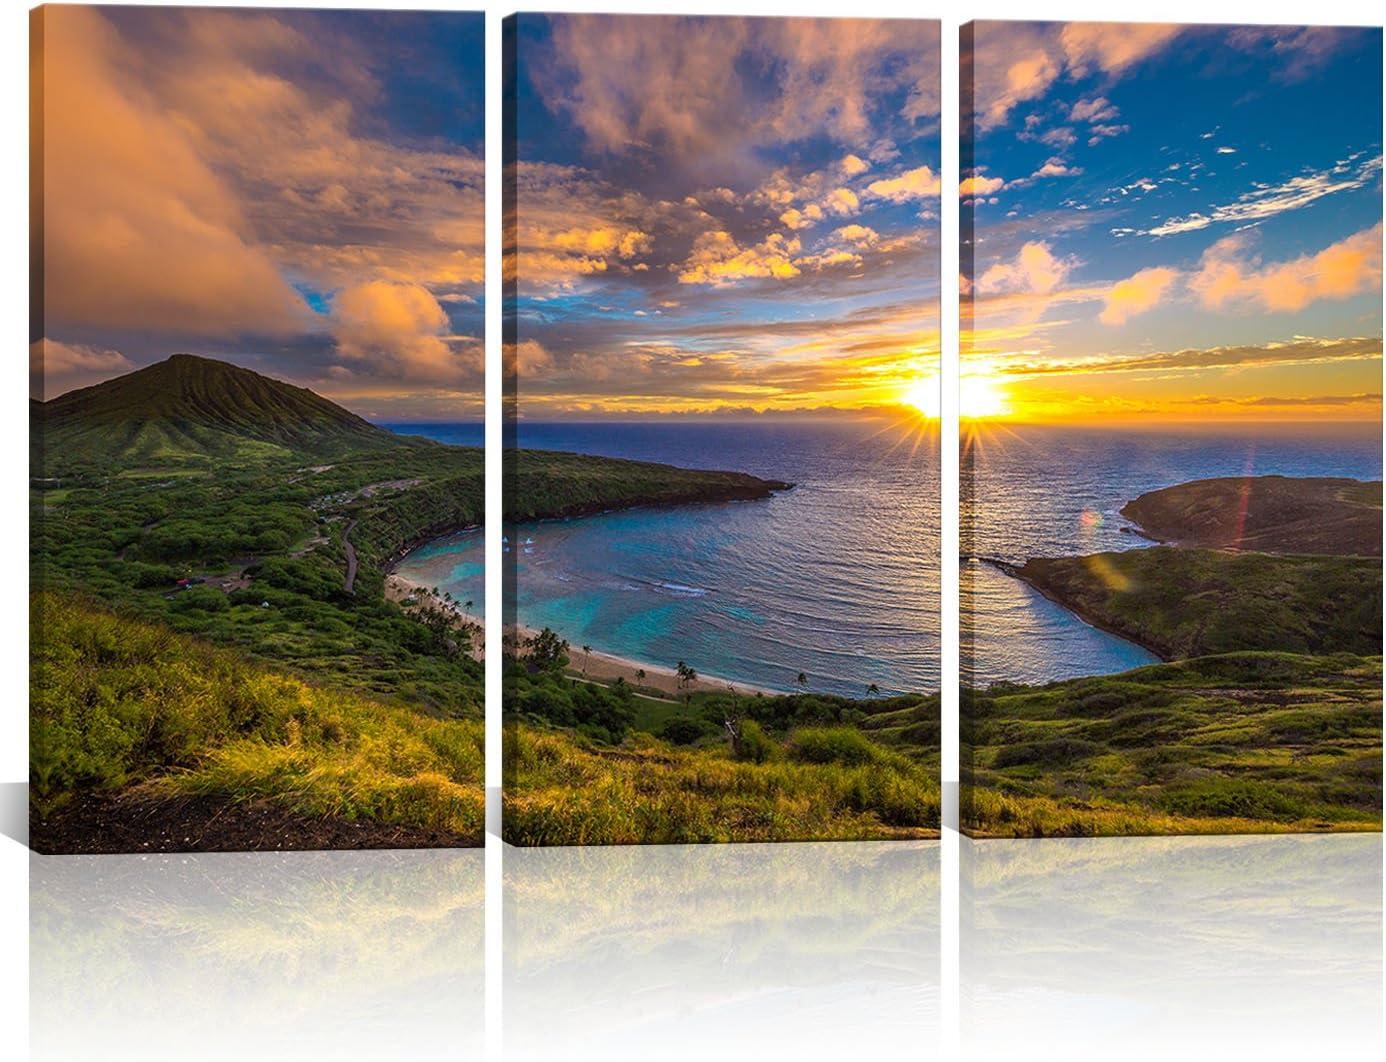 Sunset on Ala Moana Beach Honolulu Hawaii Large Canvas Wall Art Picture Print A0